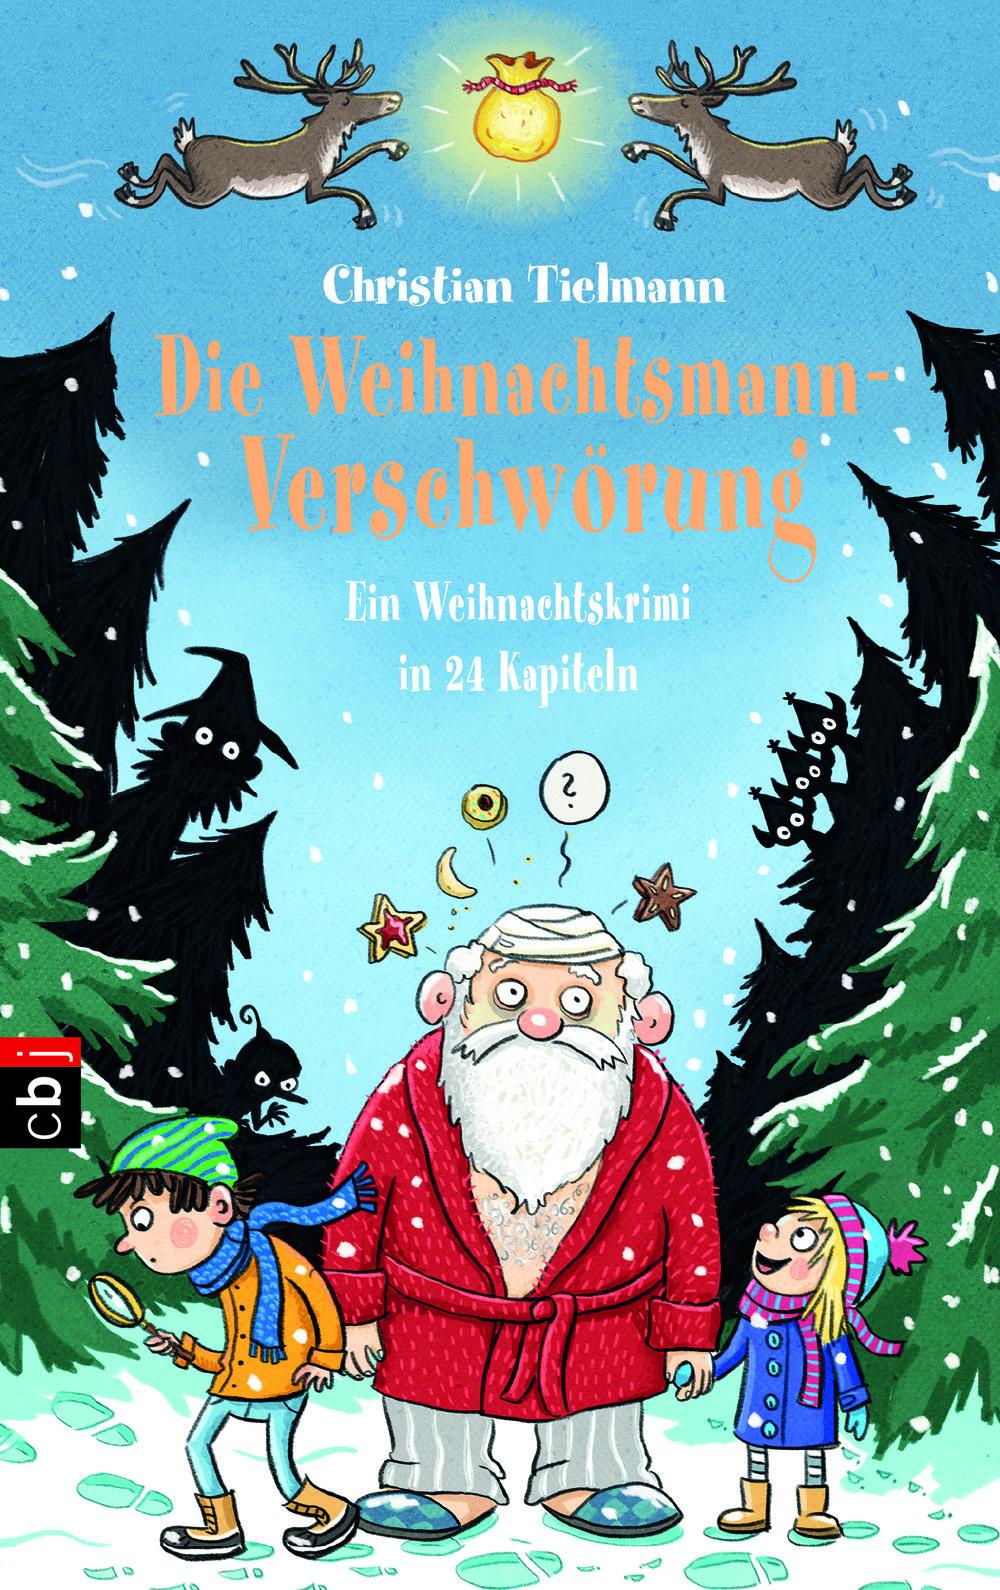 Buchcover, anklicken und beim Verlag kaufen    Book cover, click on it for purchase via the publisher